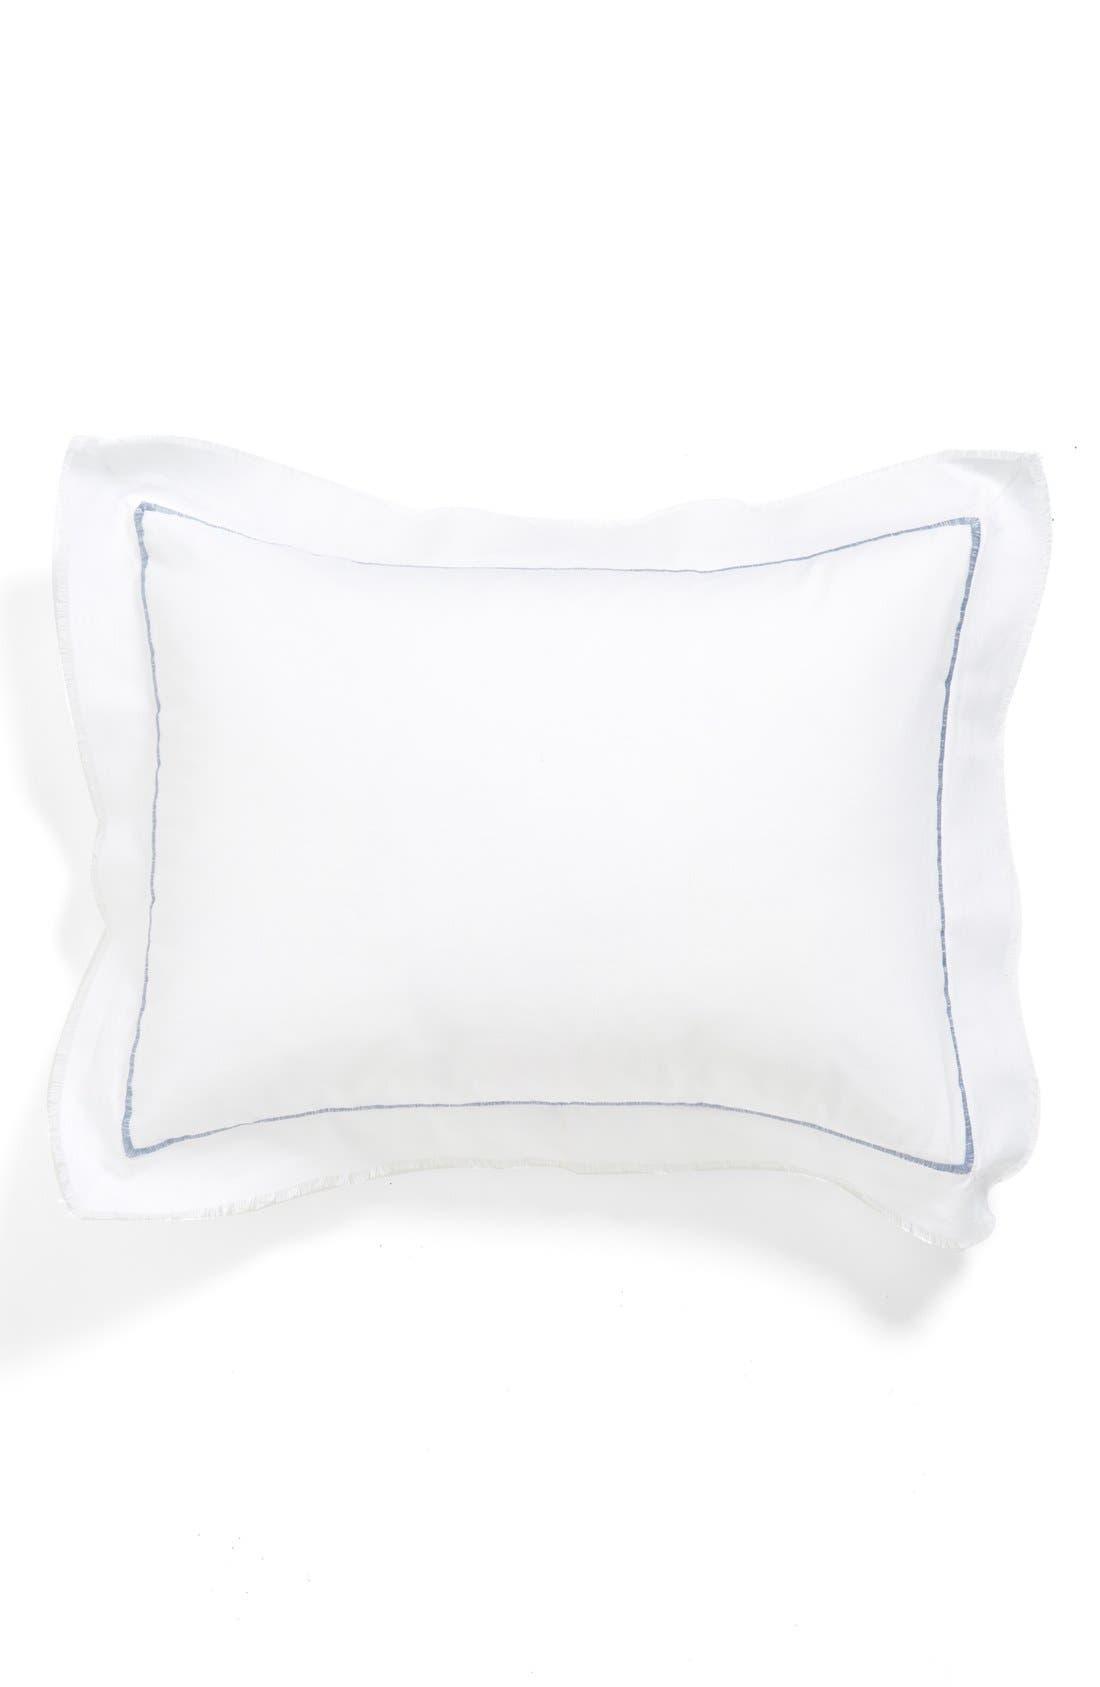 Alternate Image 1 Selected - Vera Wang 'Scrolls' Pillow